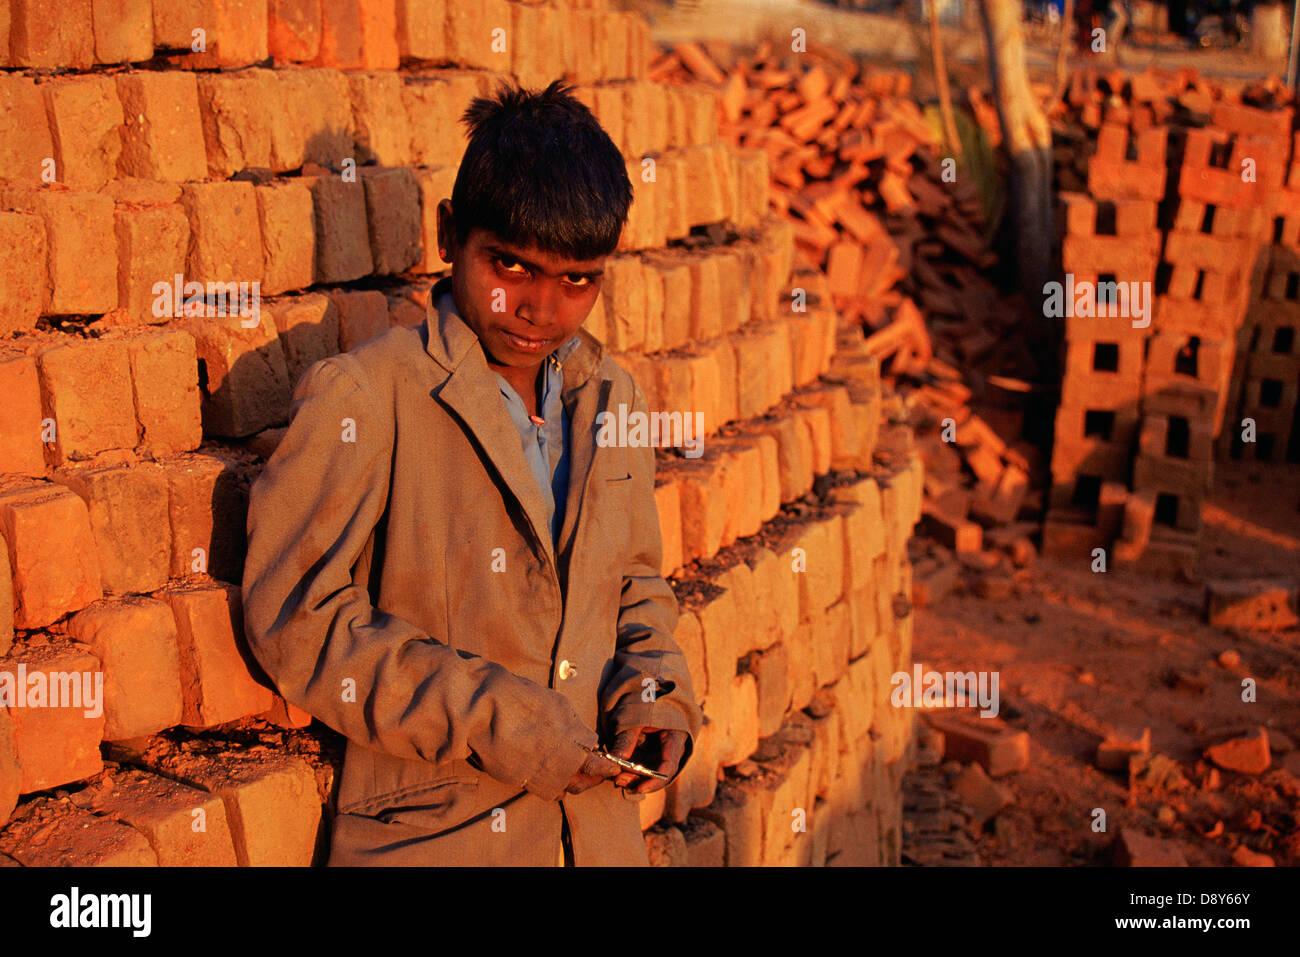 Boy working in a brickyard ( India) - Stock Image